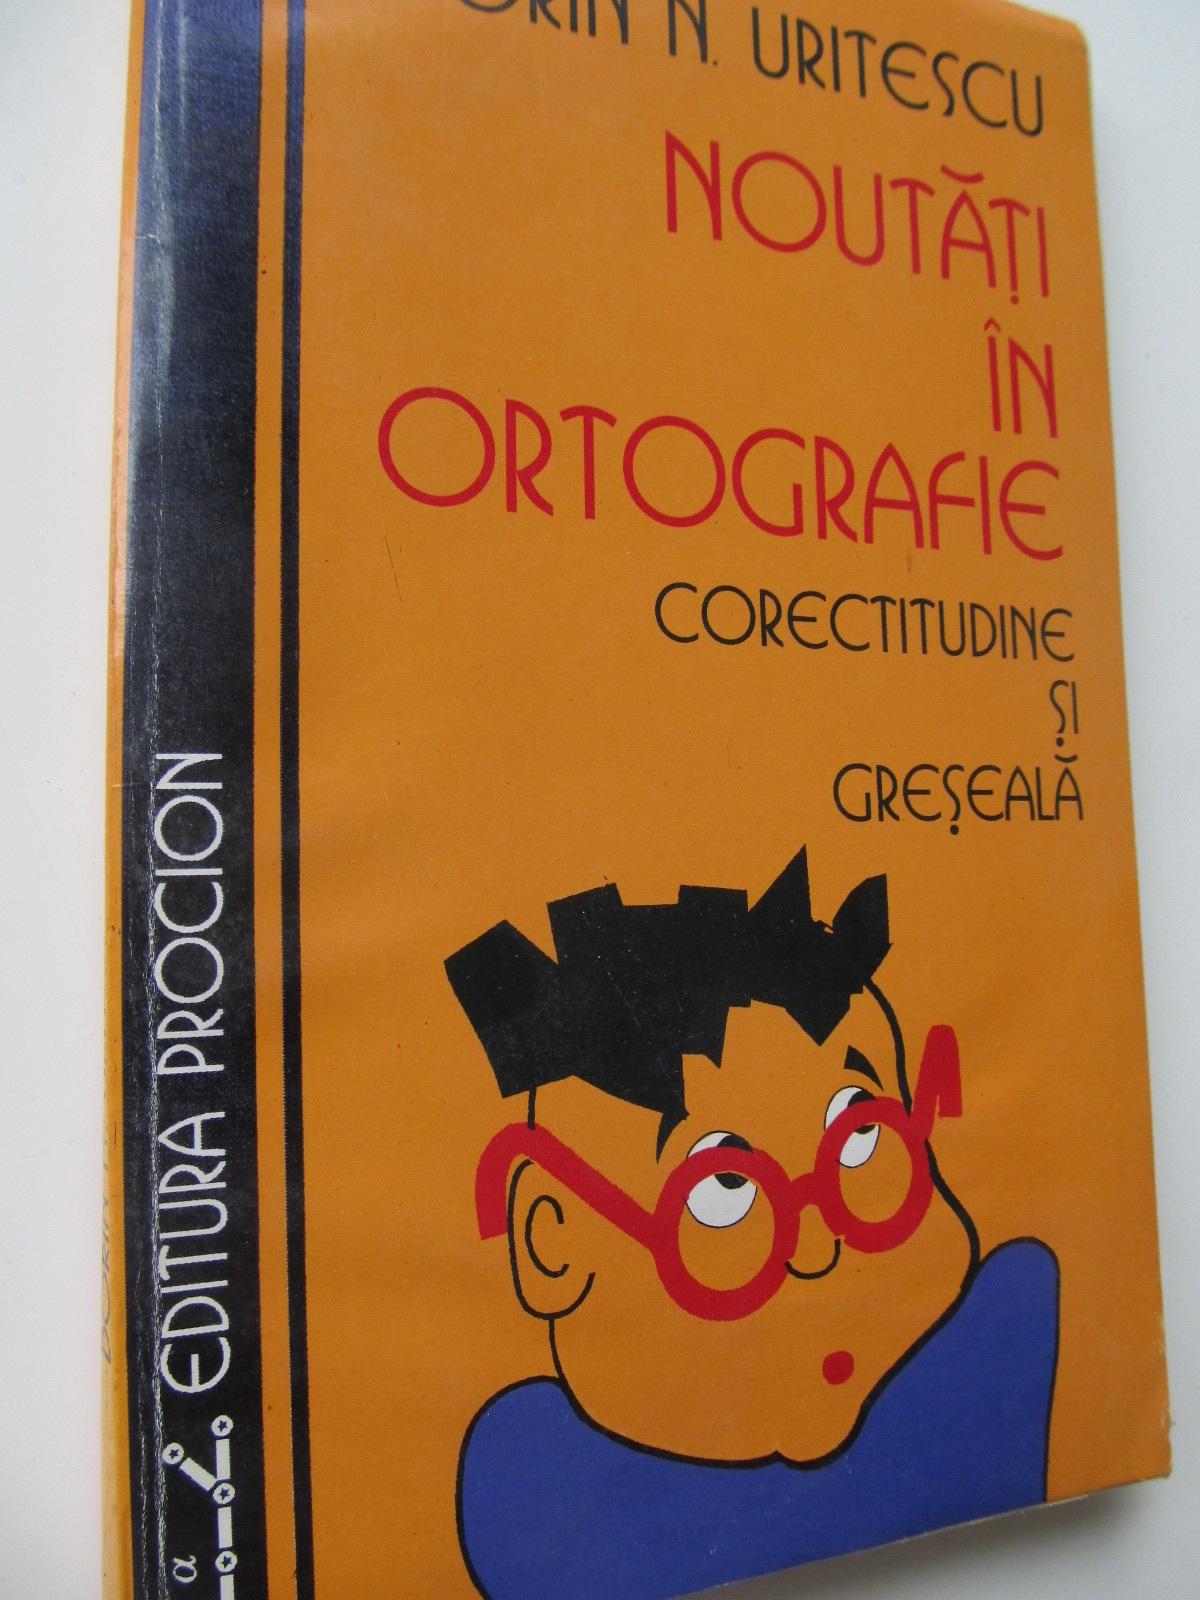 Noutati in ortografie - Corectitudine si greseala - Dorin N. Uritescu | Detalii carte